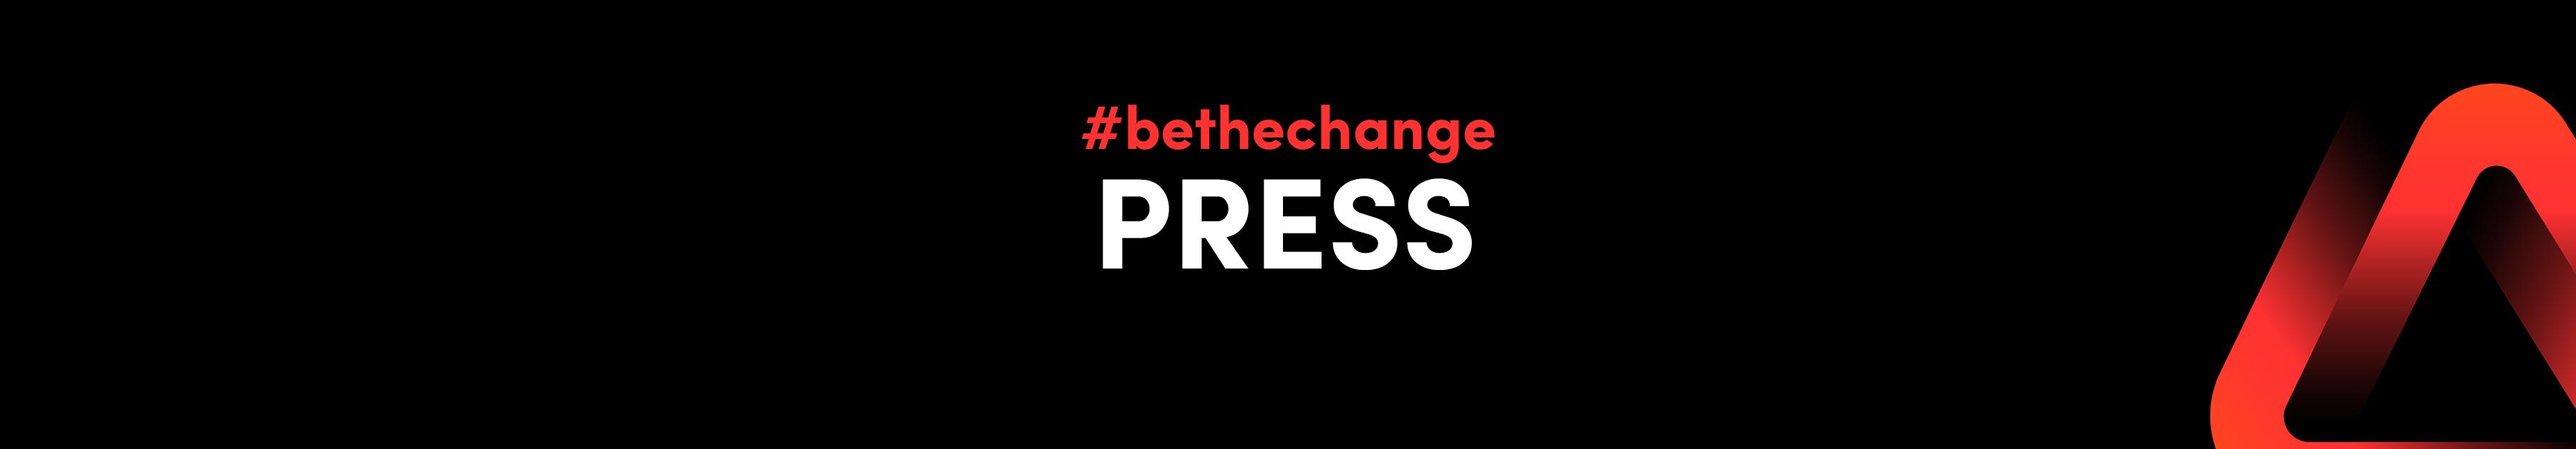 #bethechange Press Contact for MoreThanDigital